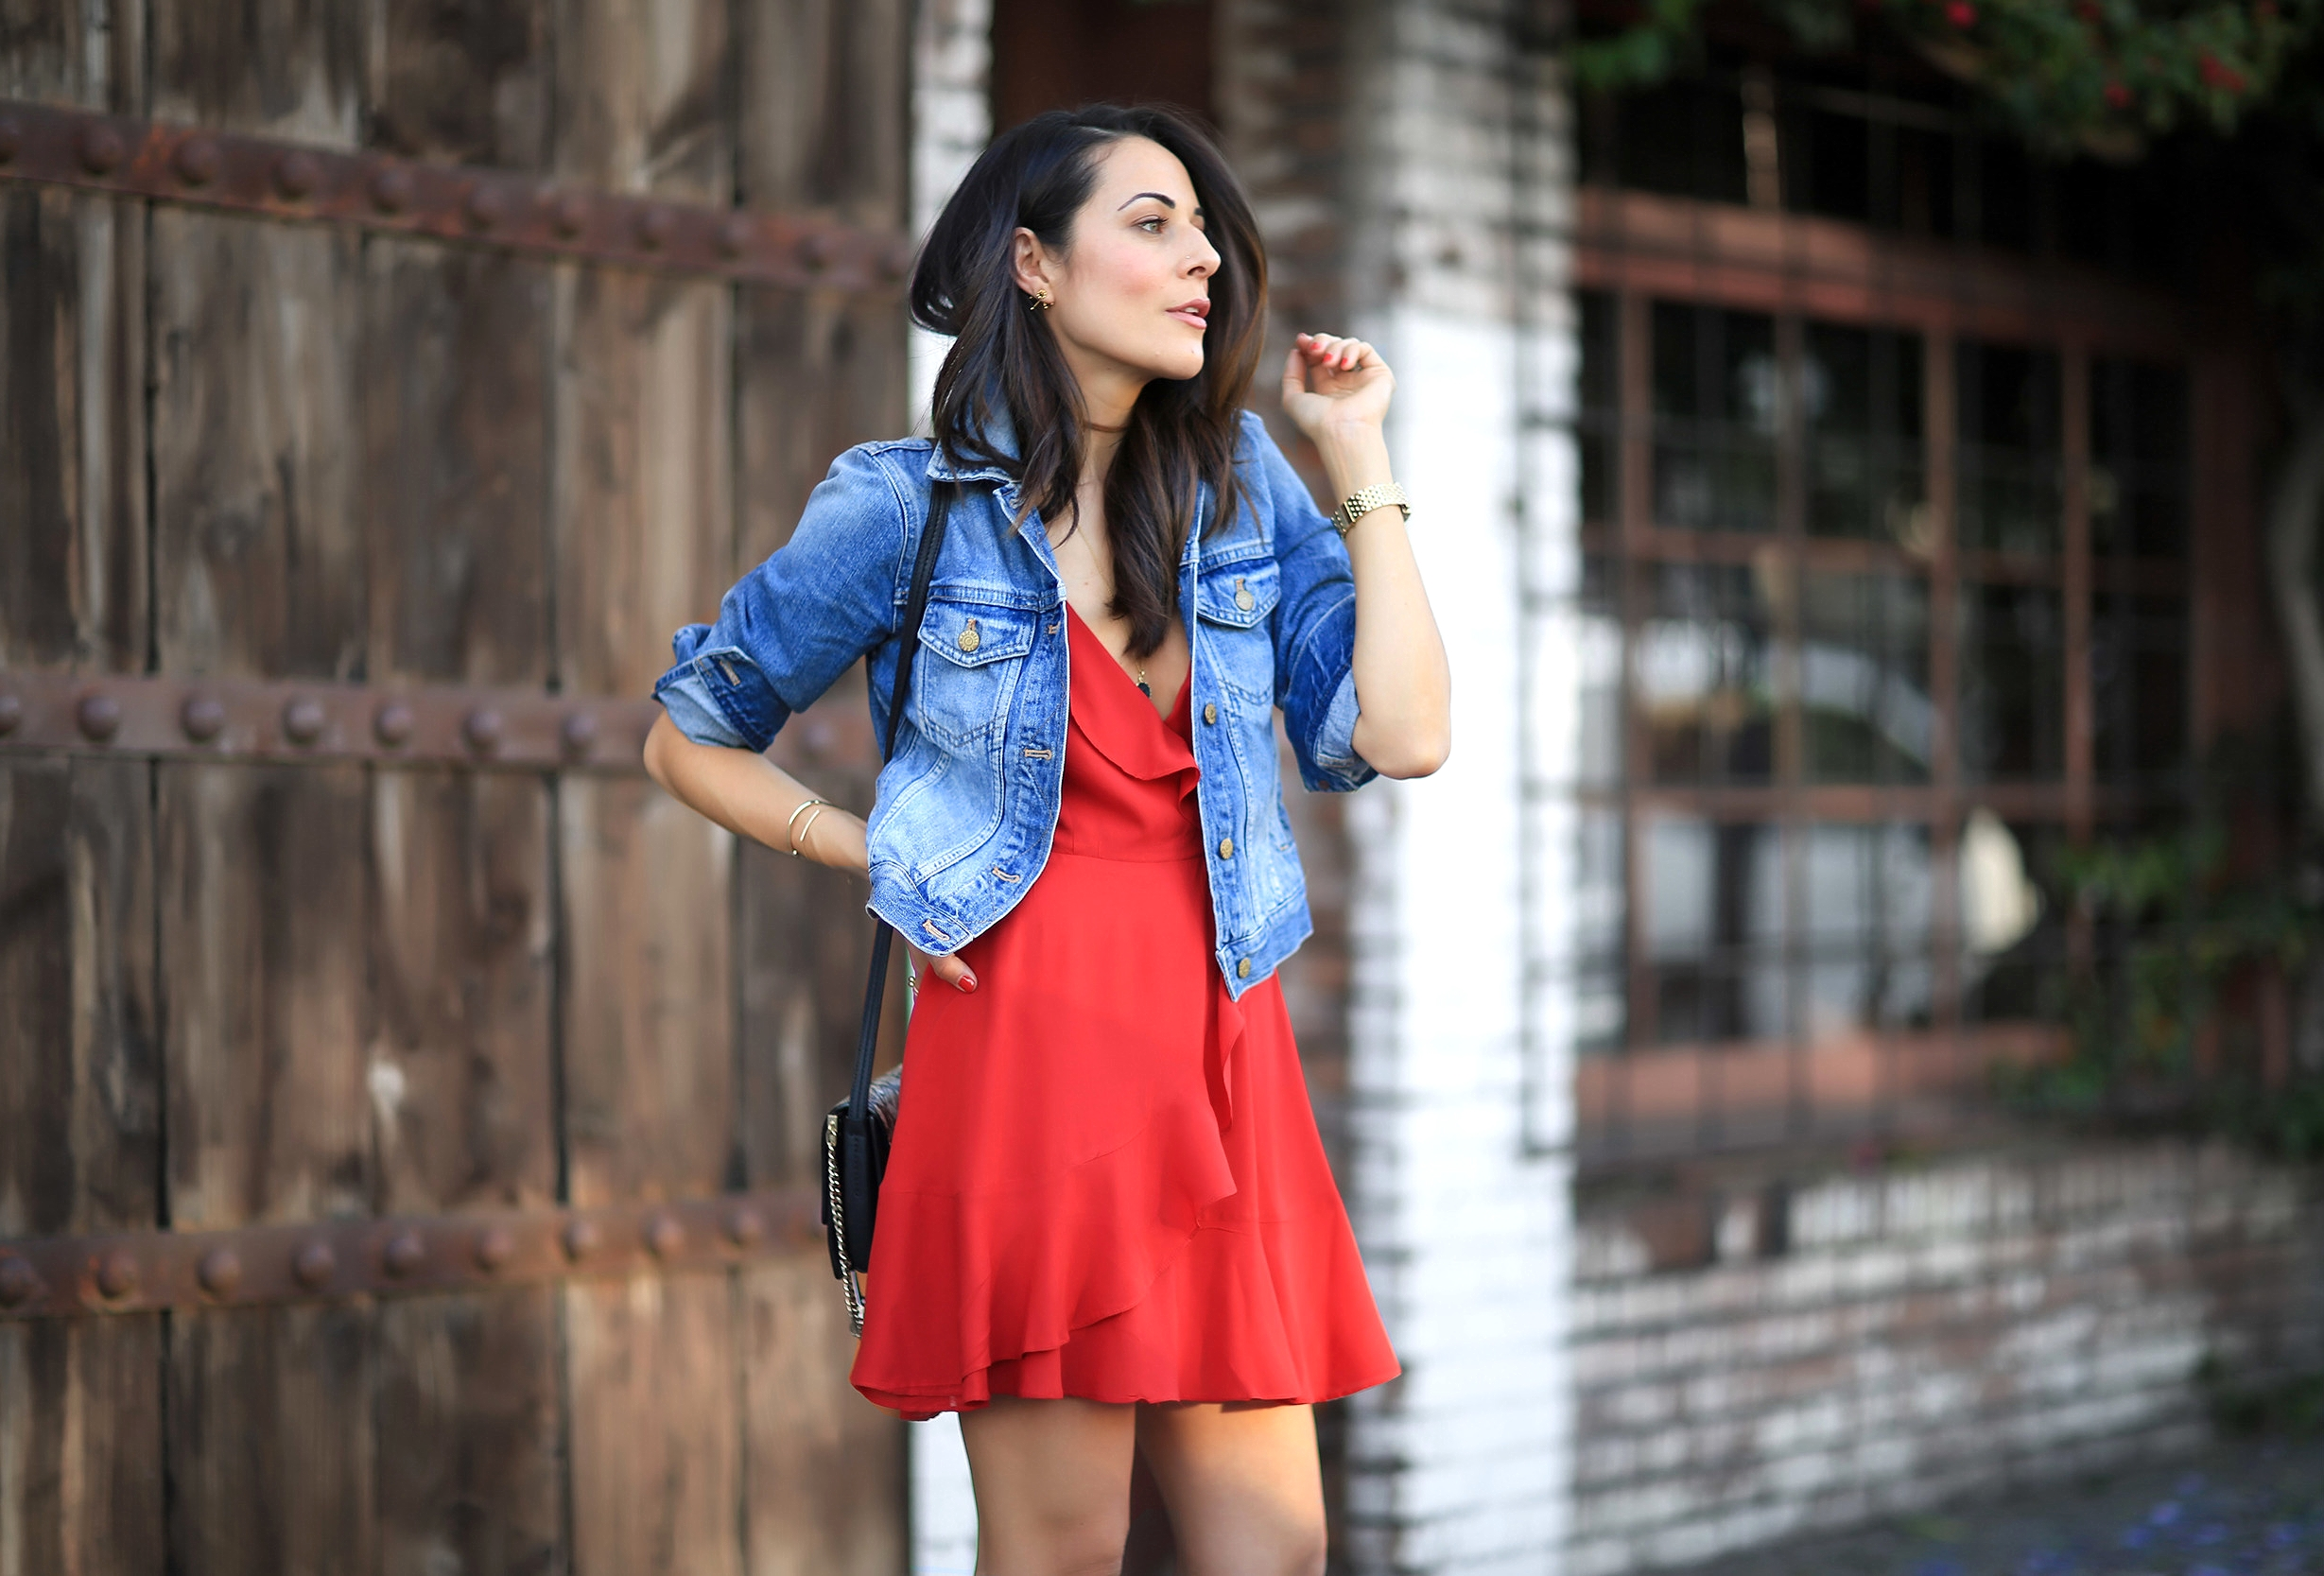 FashionBlogger_LucysWhims_SanDiego_UrbanOutfitters_Streetstyle_Madewell.jpg